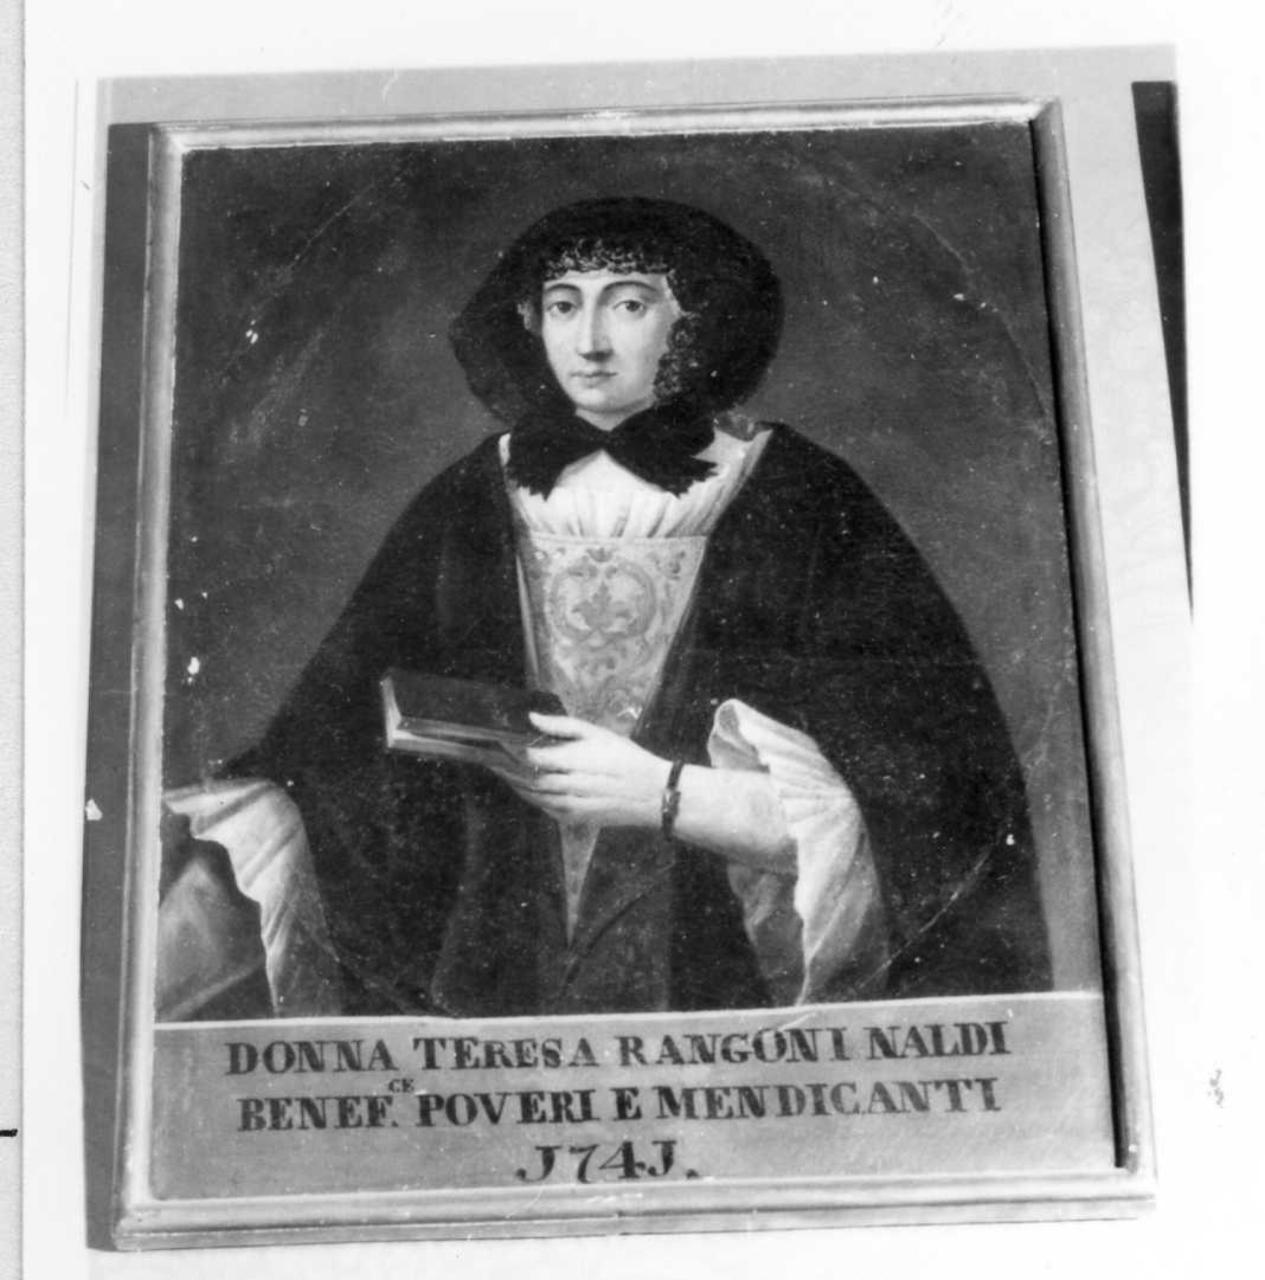 Teresa Rangoni Naldi (dipinto) - ambito modenese (prima metà sec. XVIII)